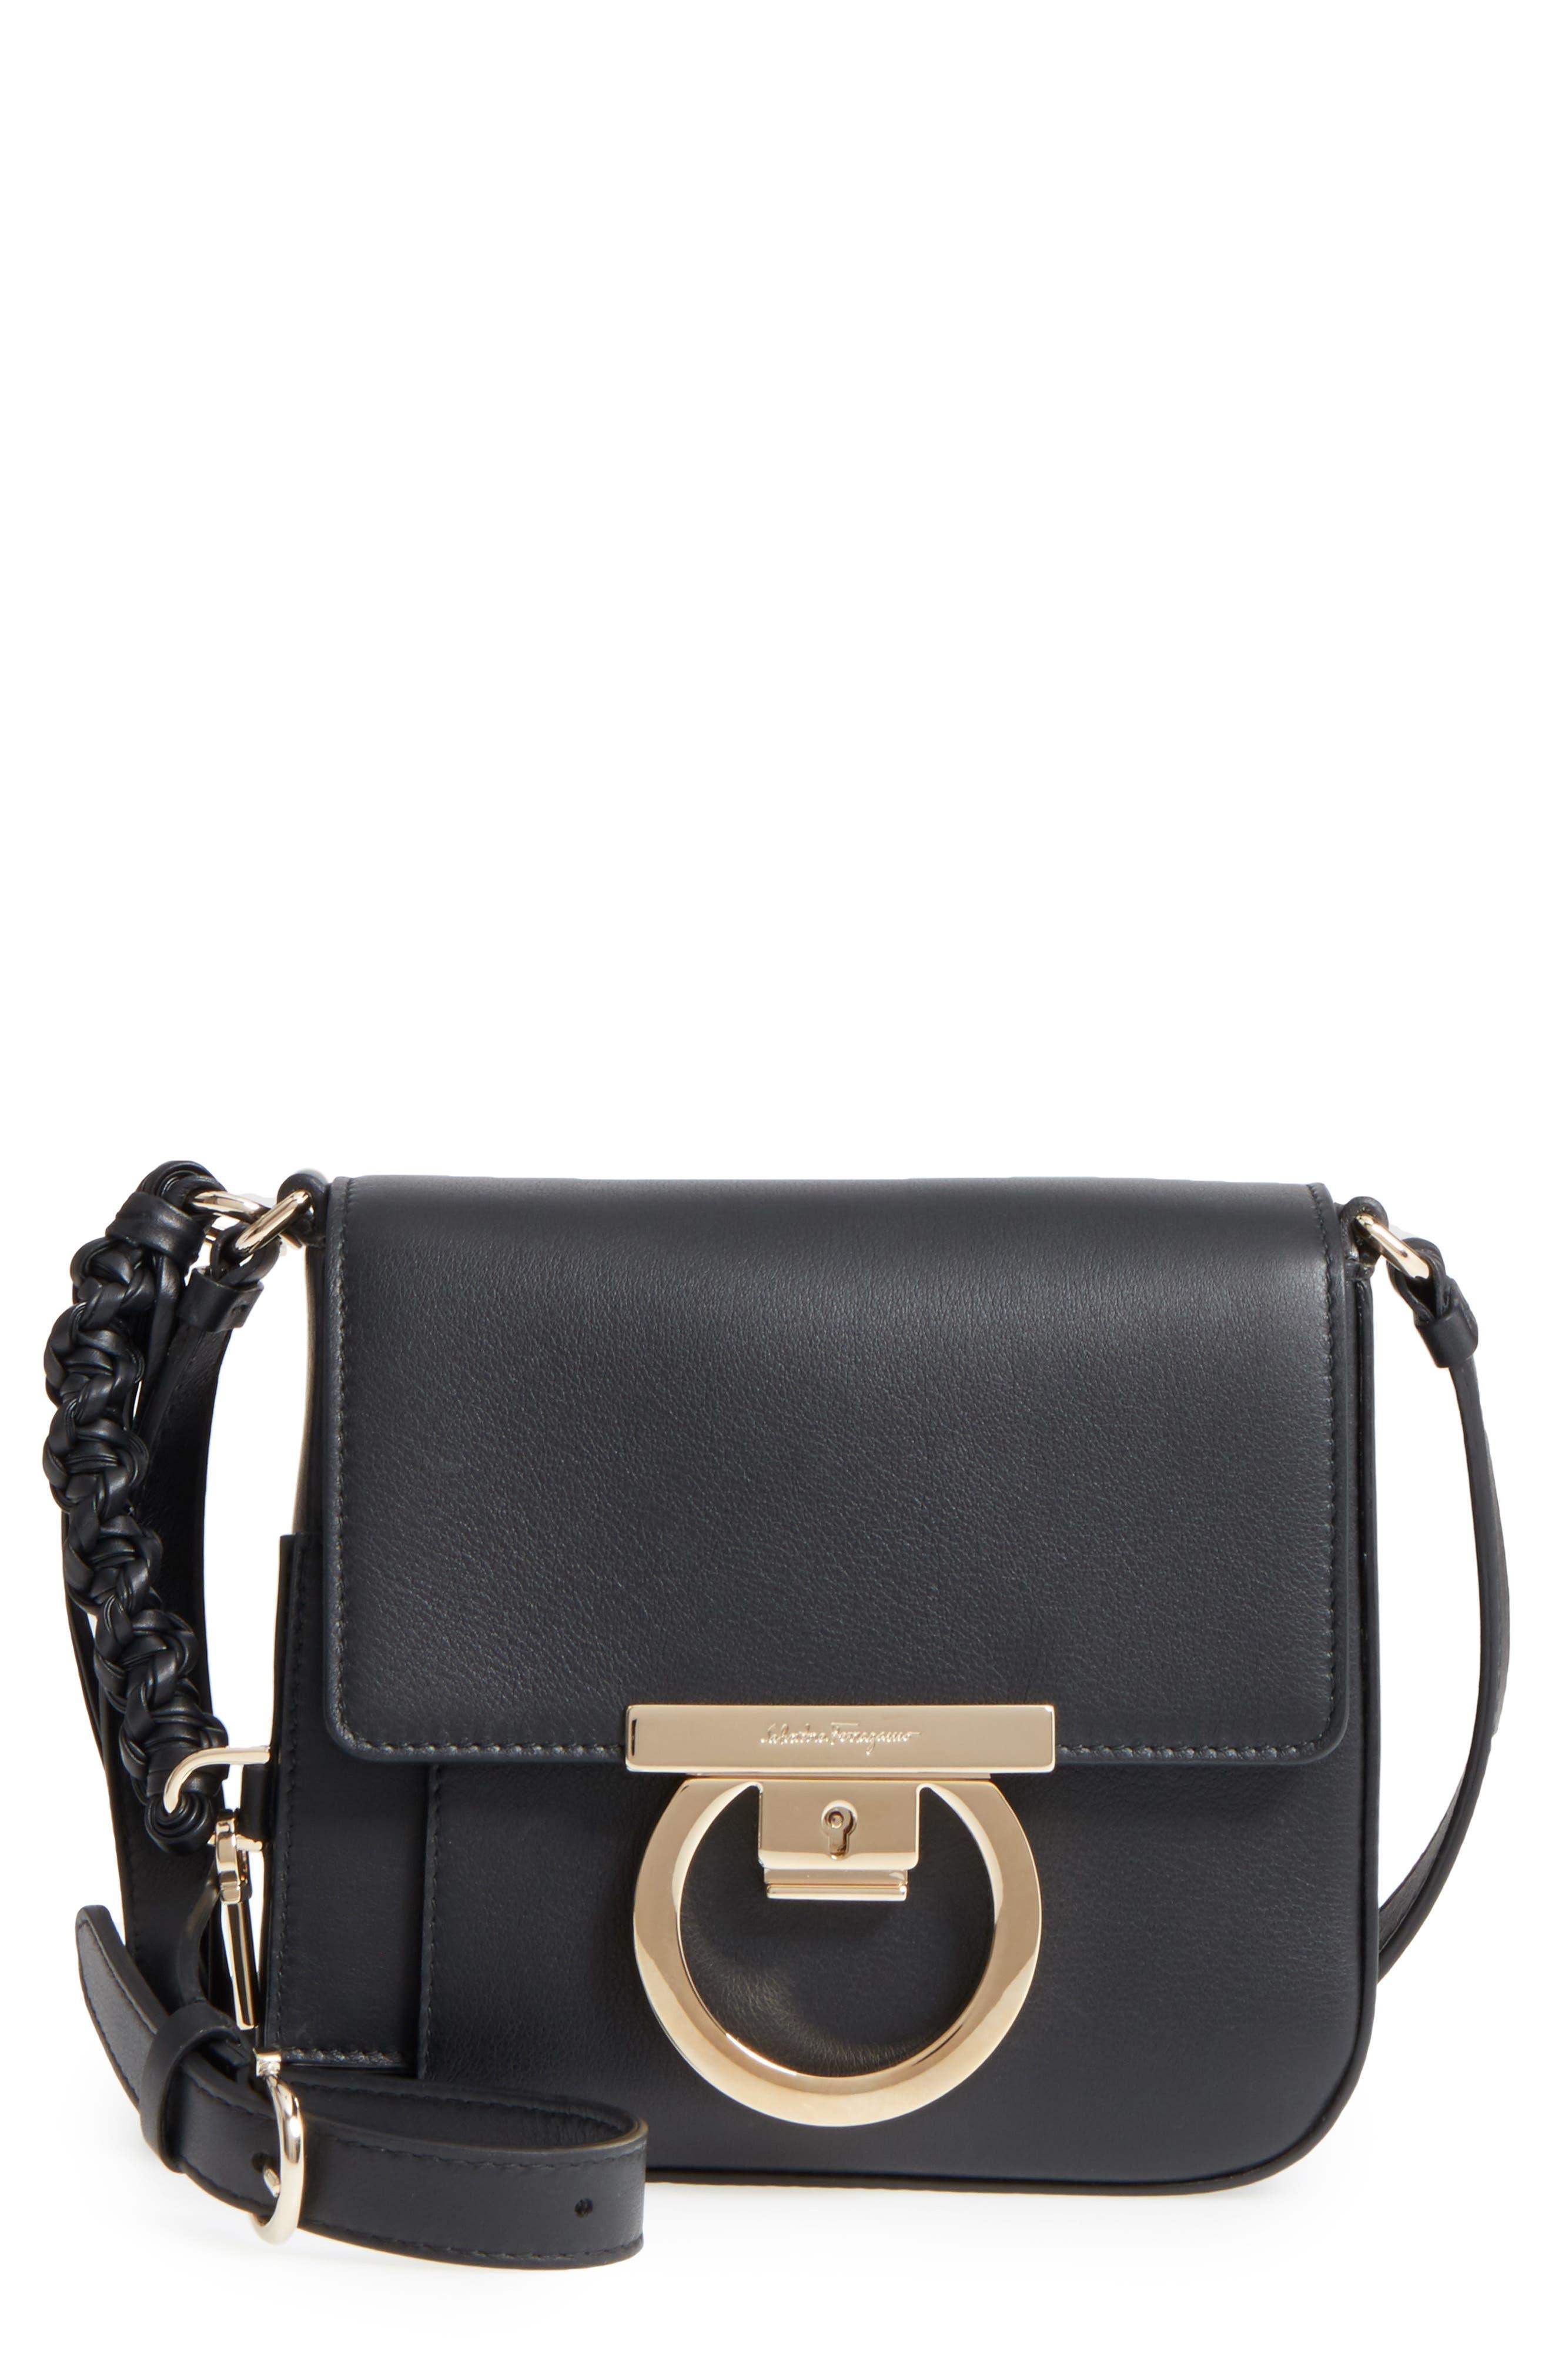 Gancio Lock Leather Crossbody Bag,                             Main thumbnail 1, color,                             Nero